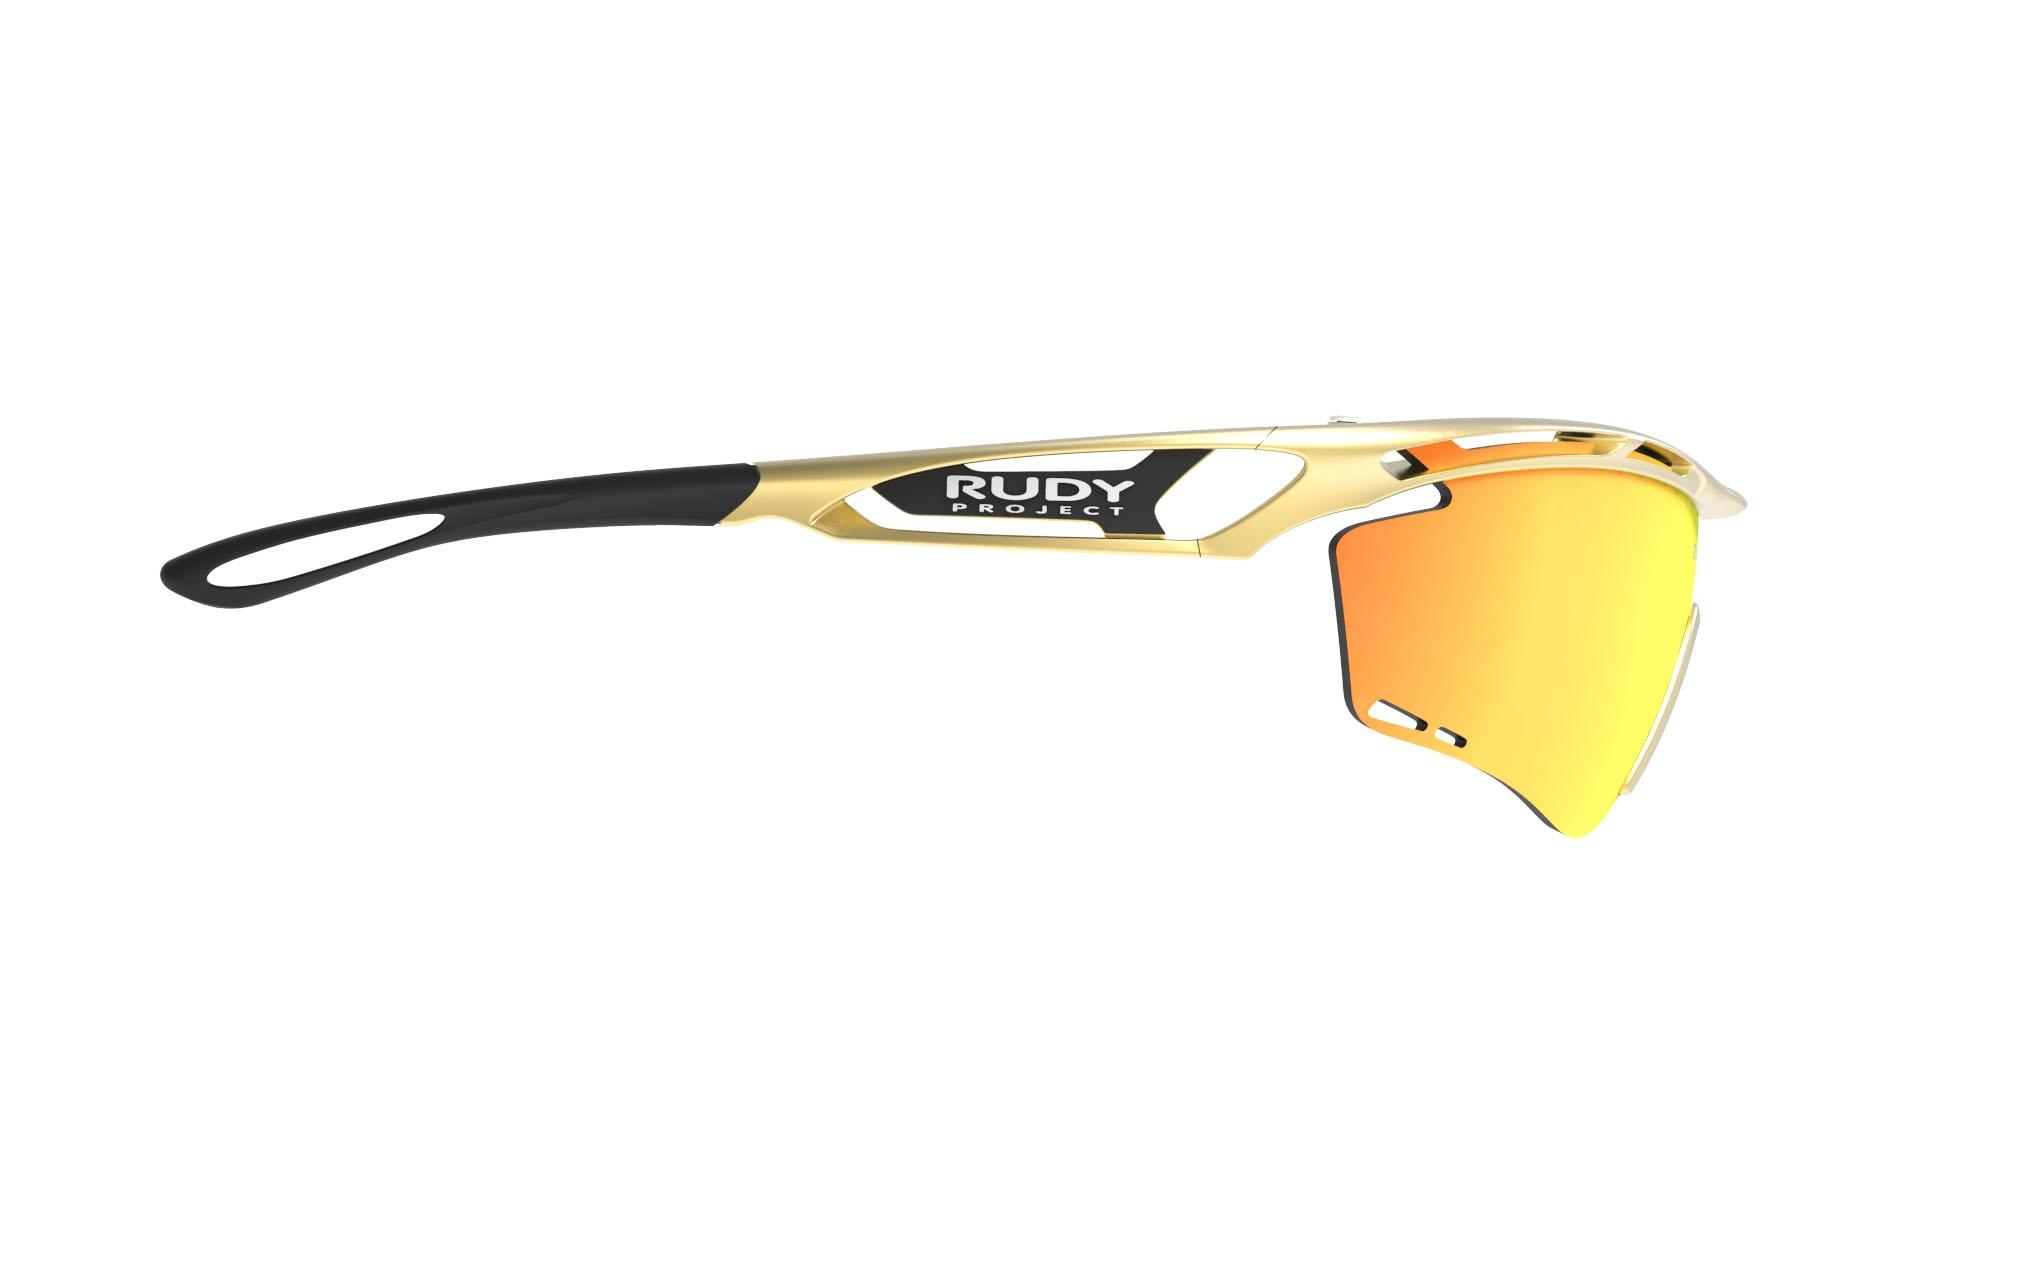 c29dadbcfe3 Performance Eyewear Tralyx - Rudy Project